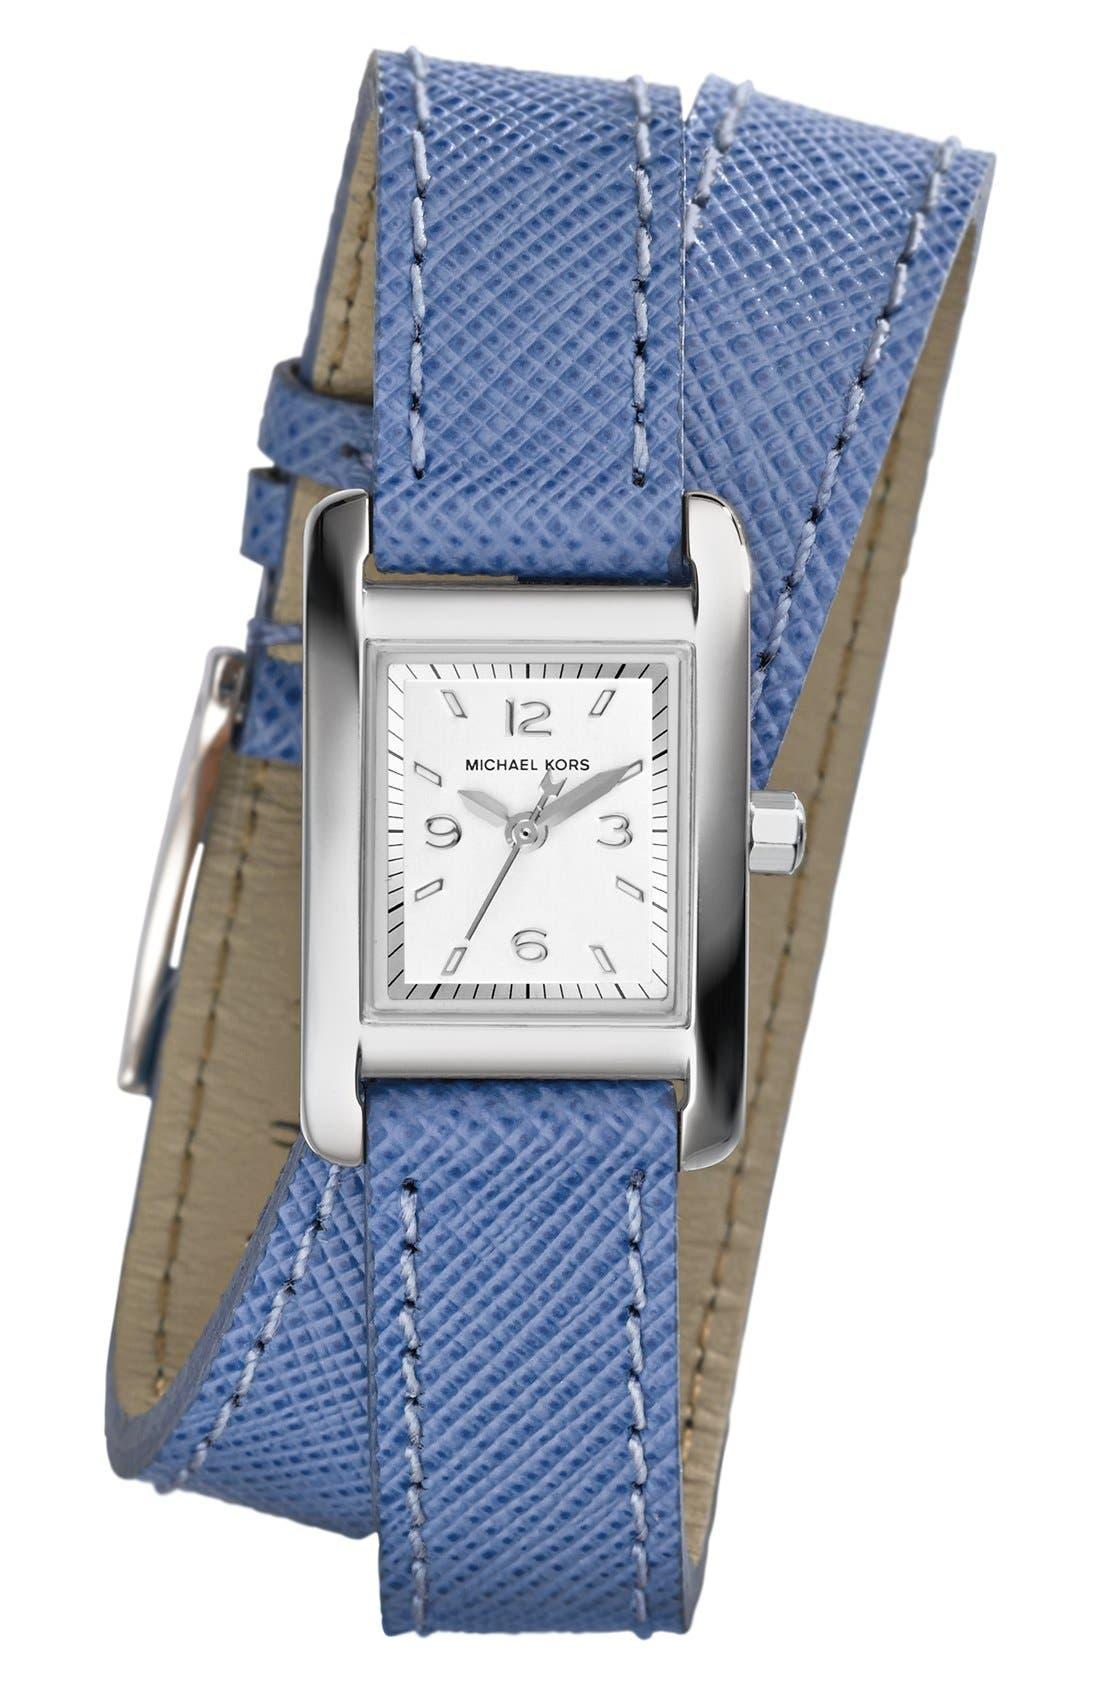 Main Image - Michael Kors 'Mini Taylor' Rectangle Leather Strap Wrap Watch, 22mm